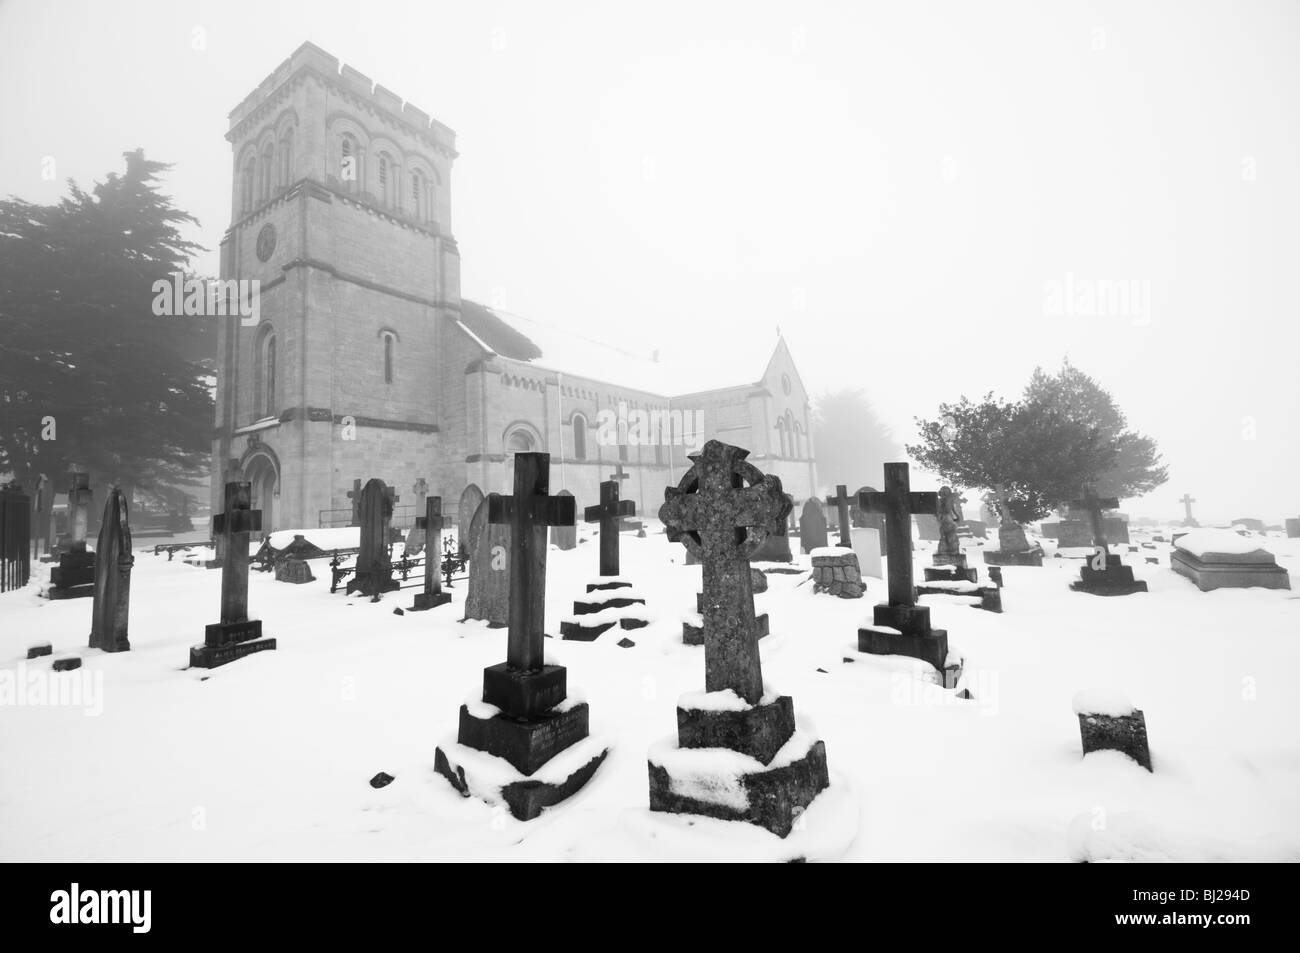 St Pauls Church, Whiteshill, Stroud, Gloucestershire, UK - Stock Image